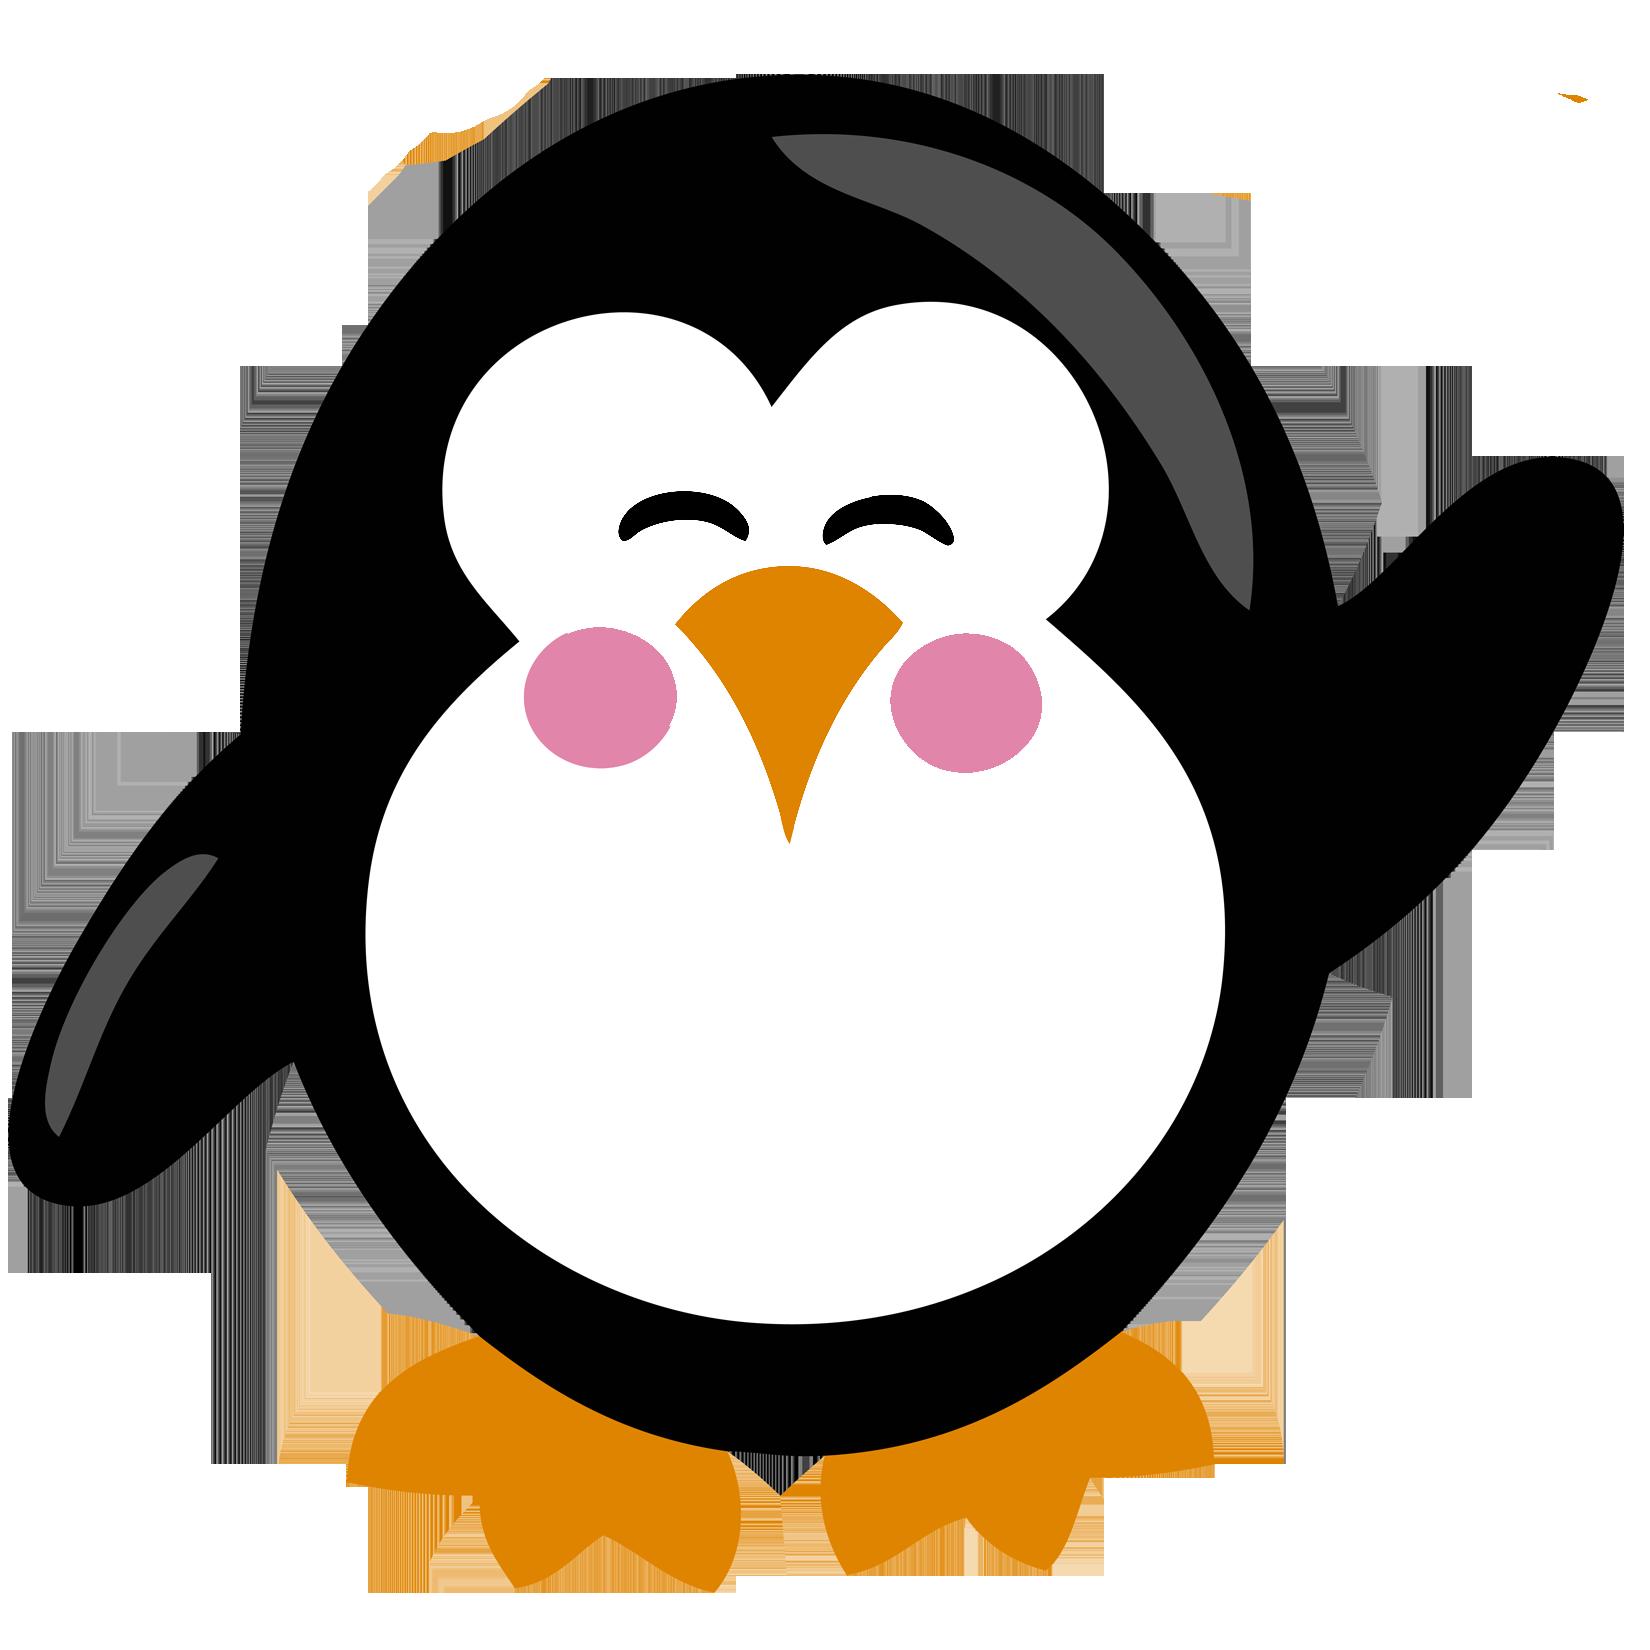 Pinguins Pingui 2 Png Minus Penguins Penguin Illustration Kids